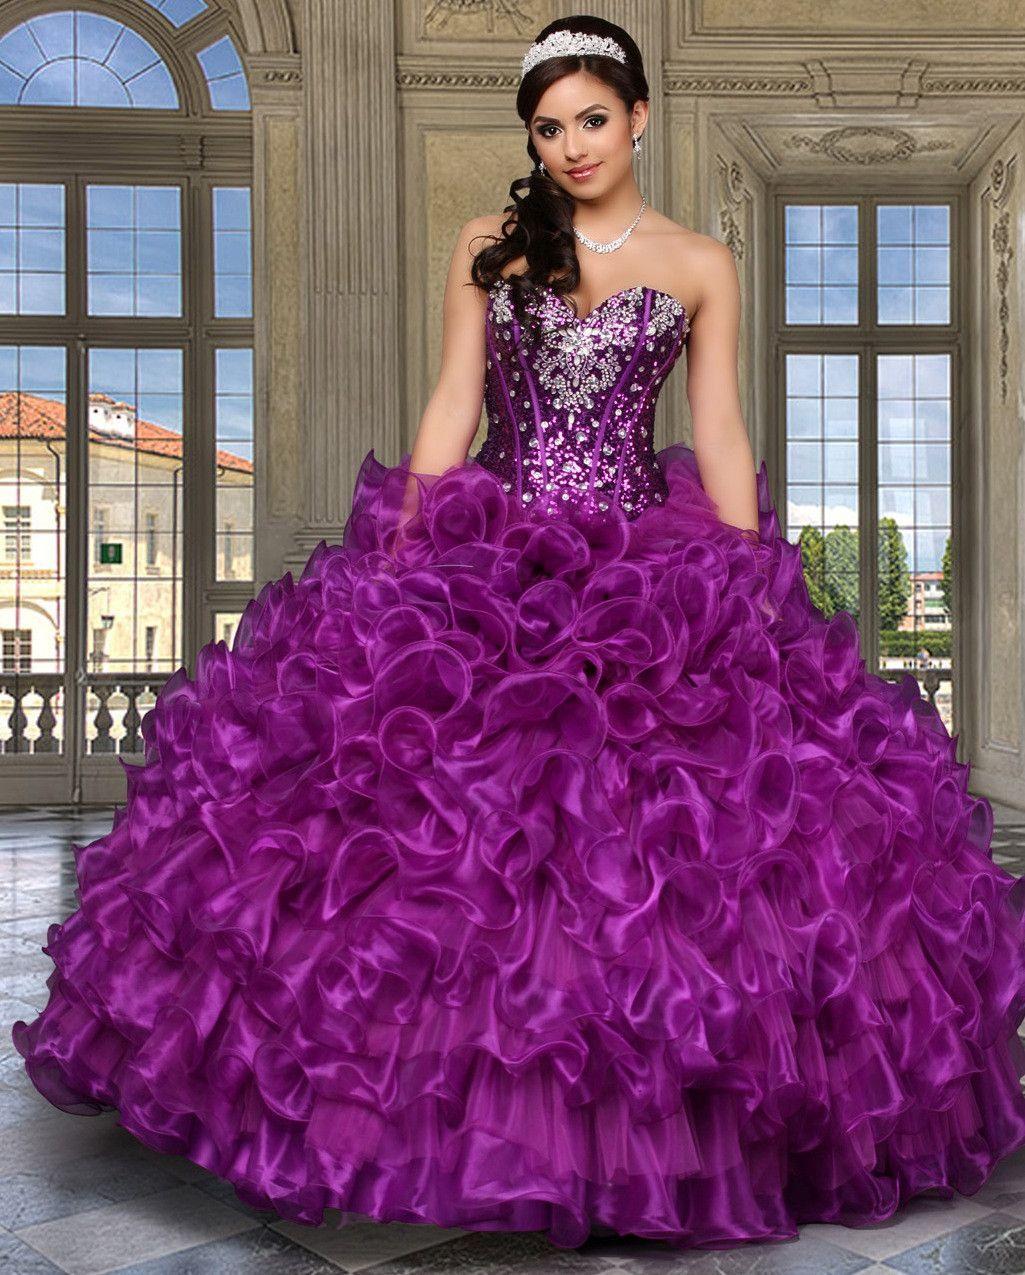 Q by DaVinci Quinceanera Dress Style 80232 | Pinterest